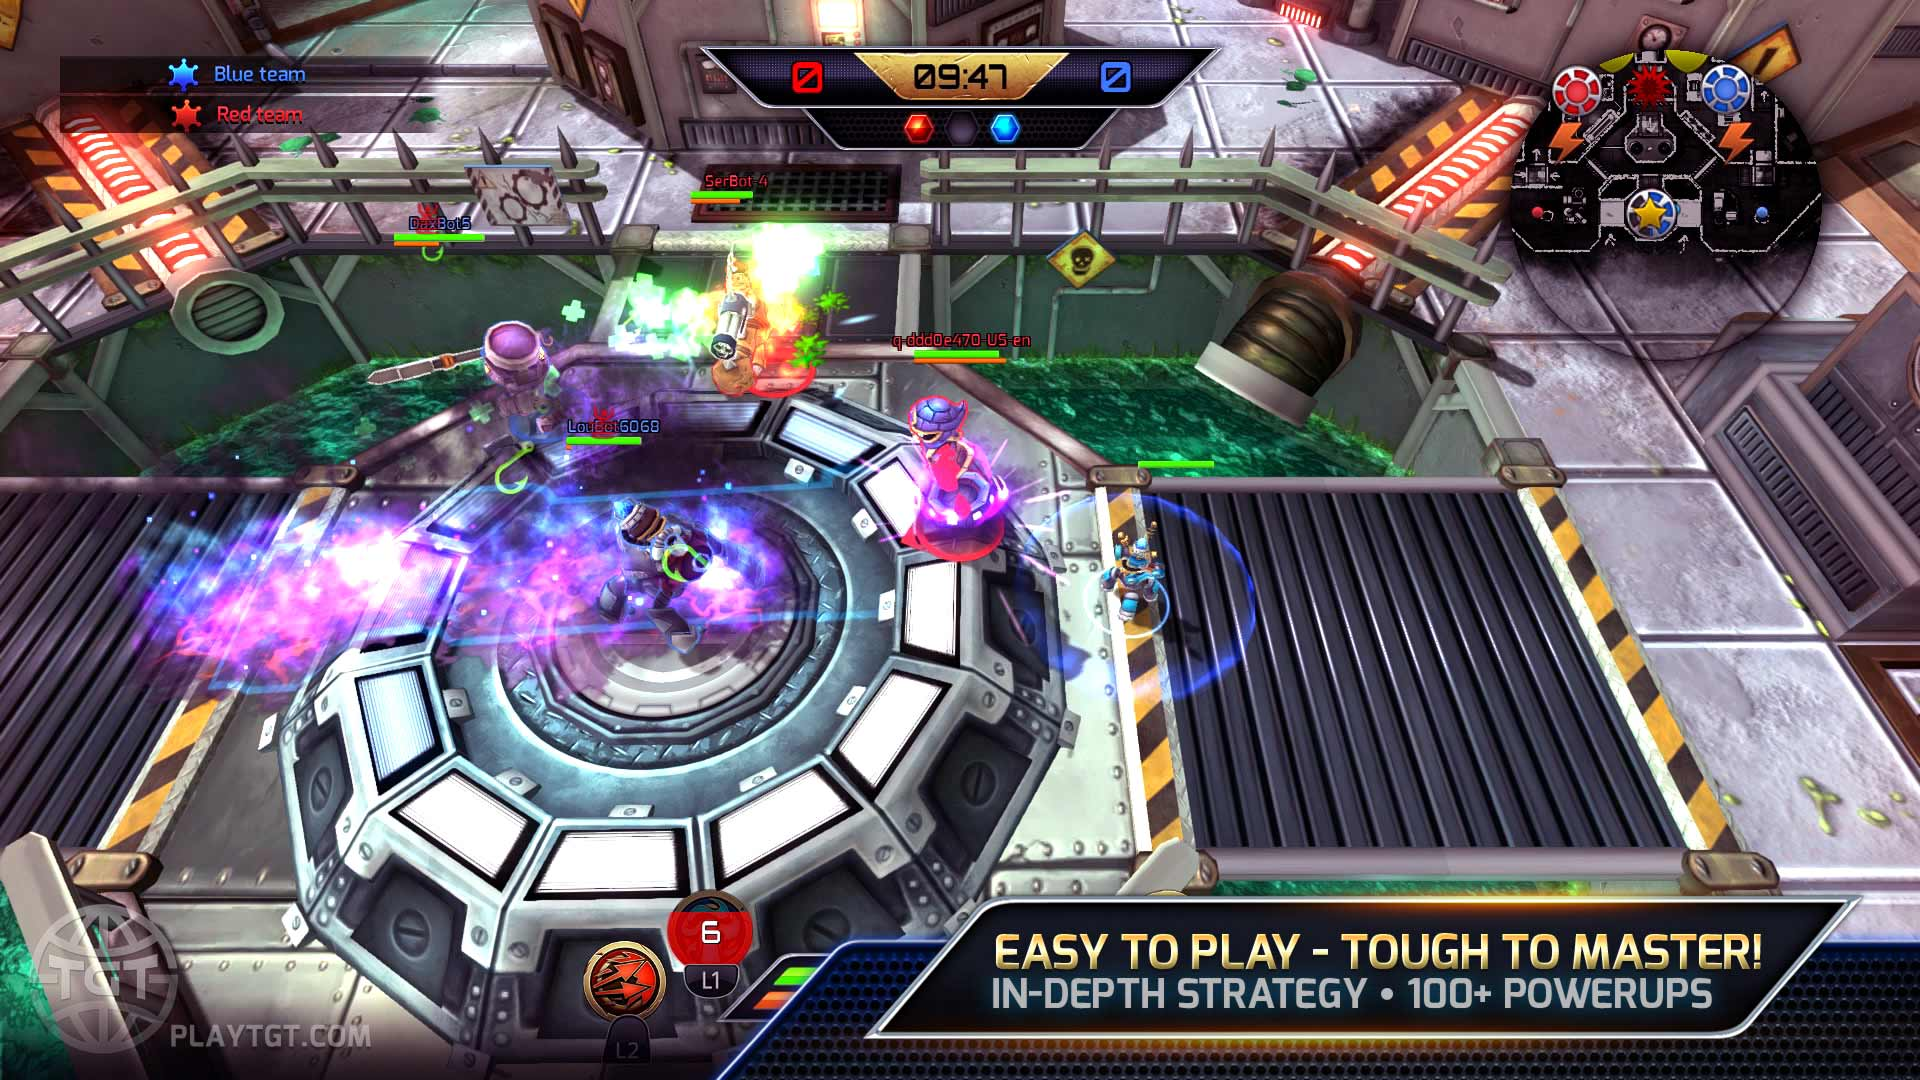 motogp 4 game free download full version for pc windows 7